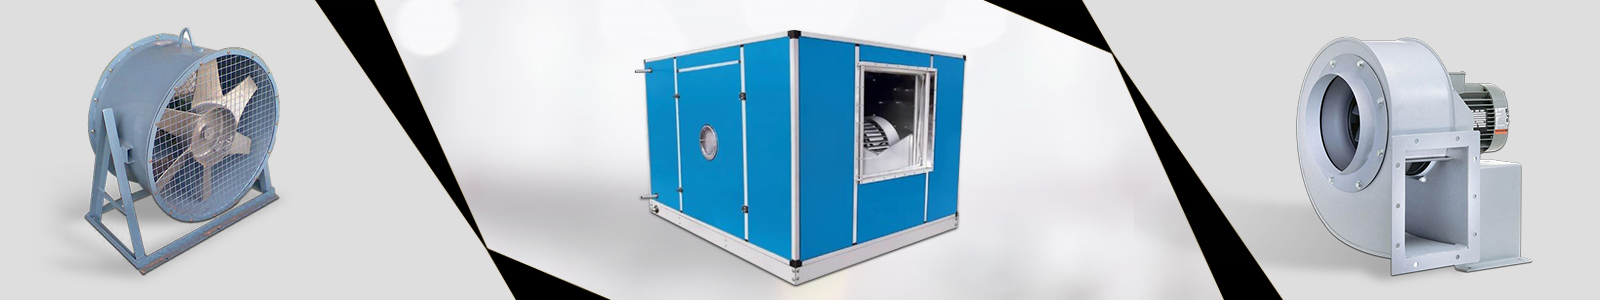 Aeronom Equipments and project